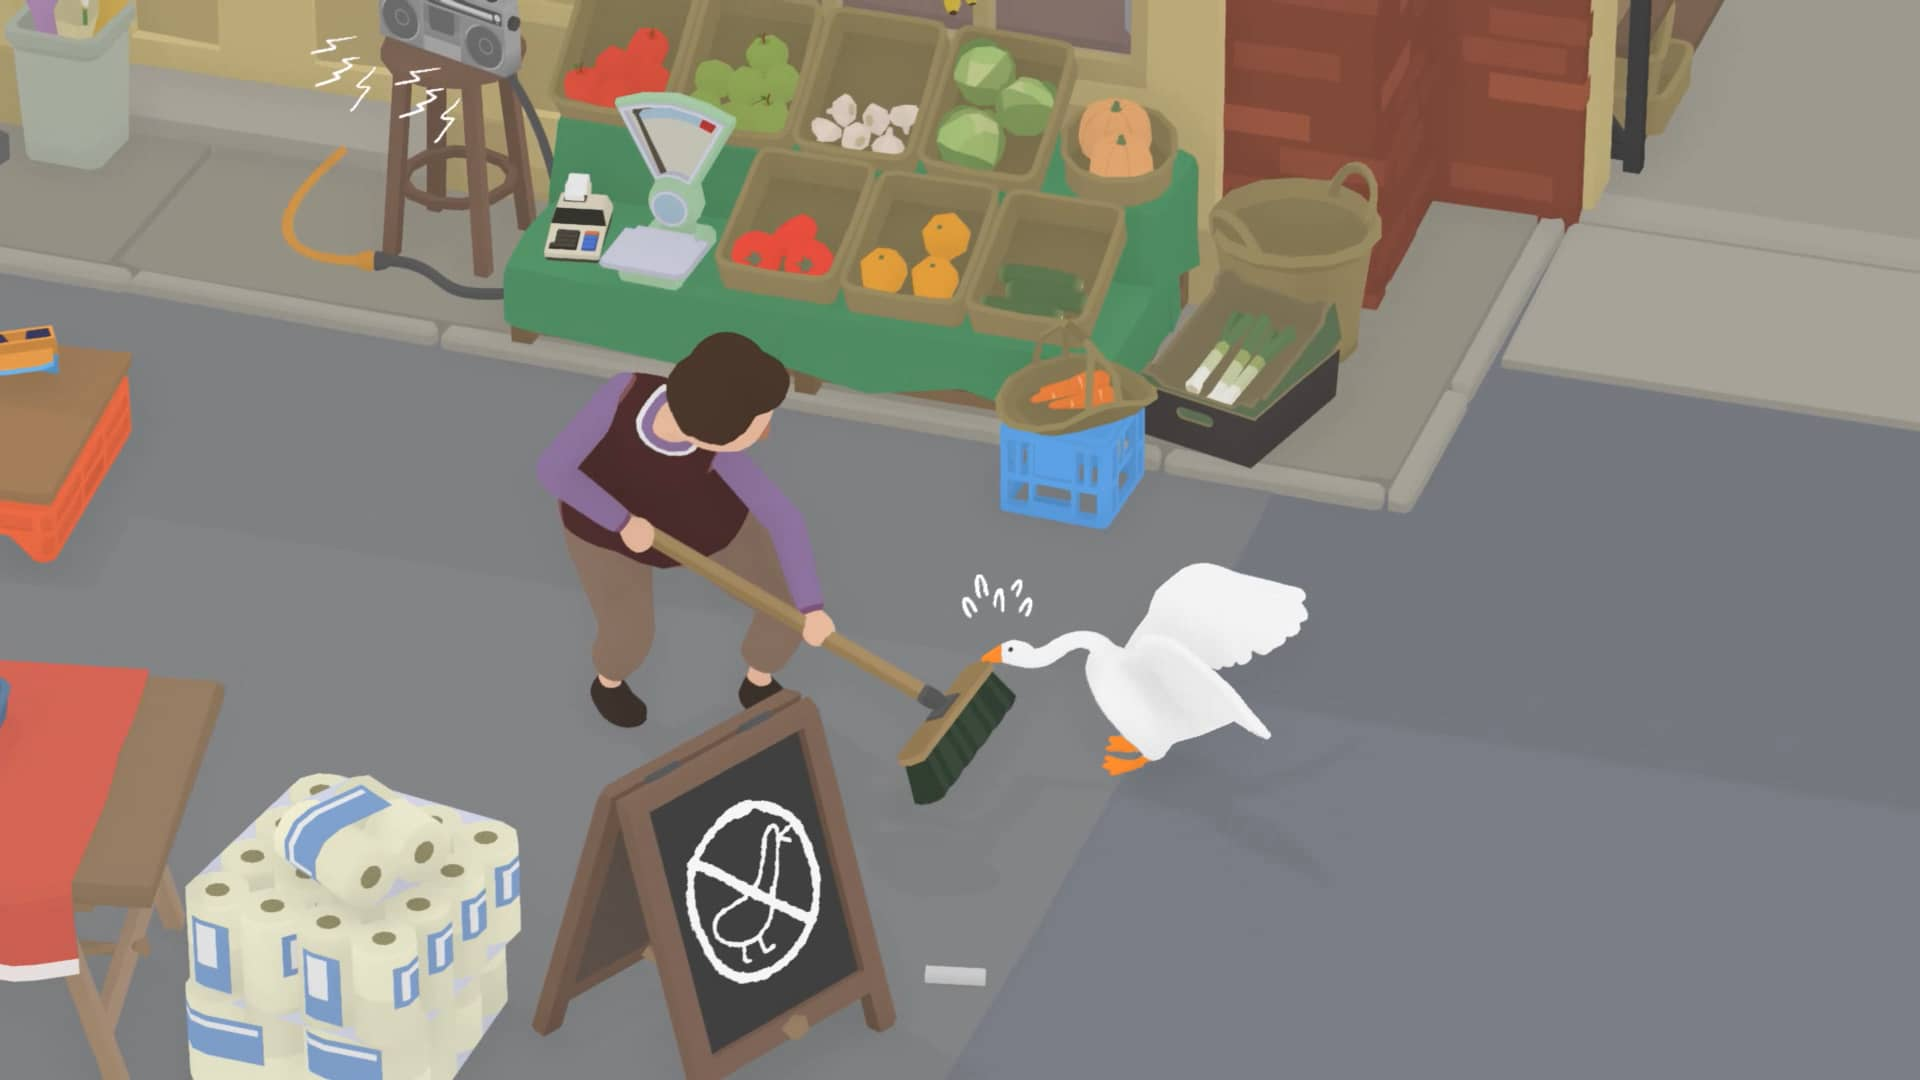 Untitled Goose Game - Boj o smeták